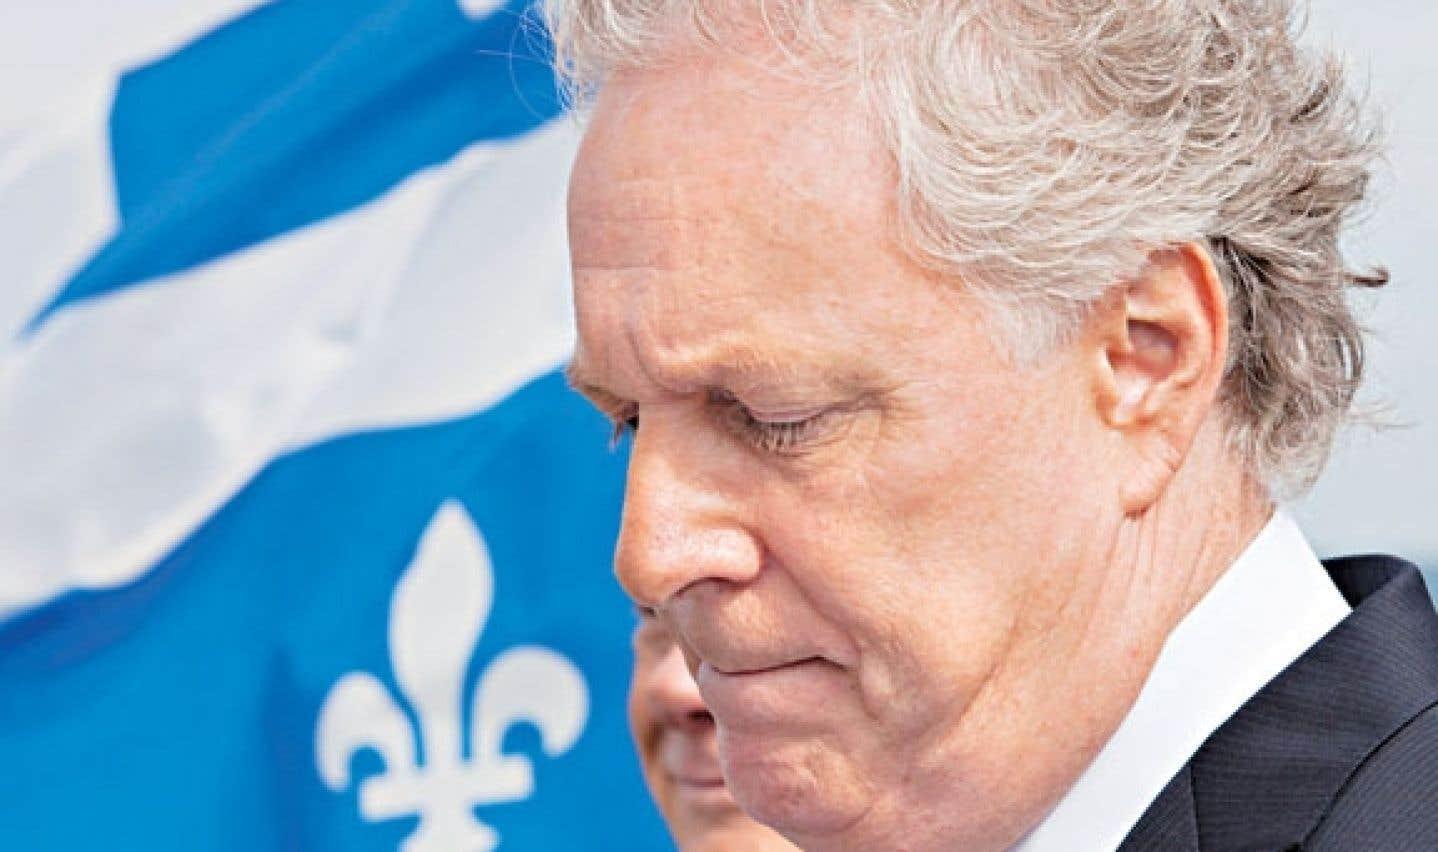 Filature interrompue - Charest voit un complot radio-canadien contre lui